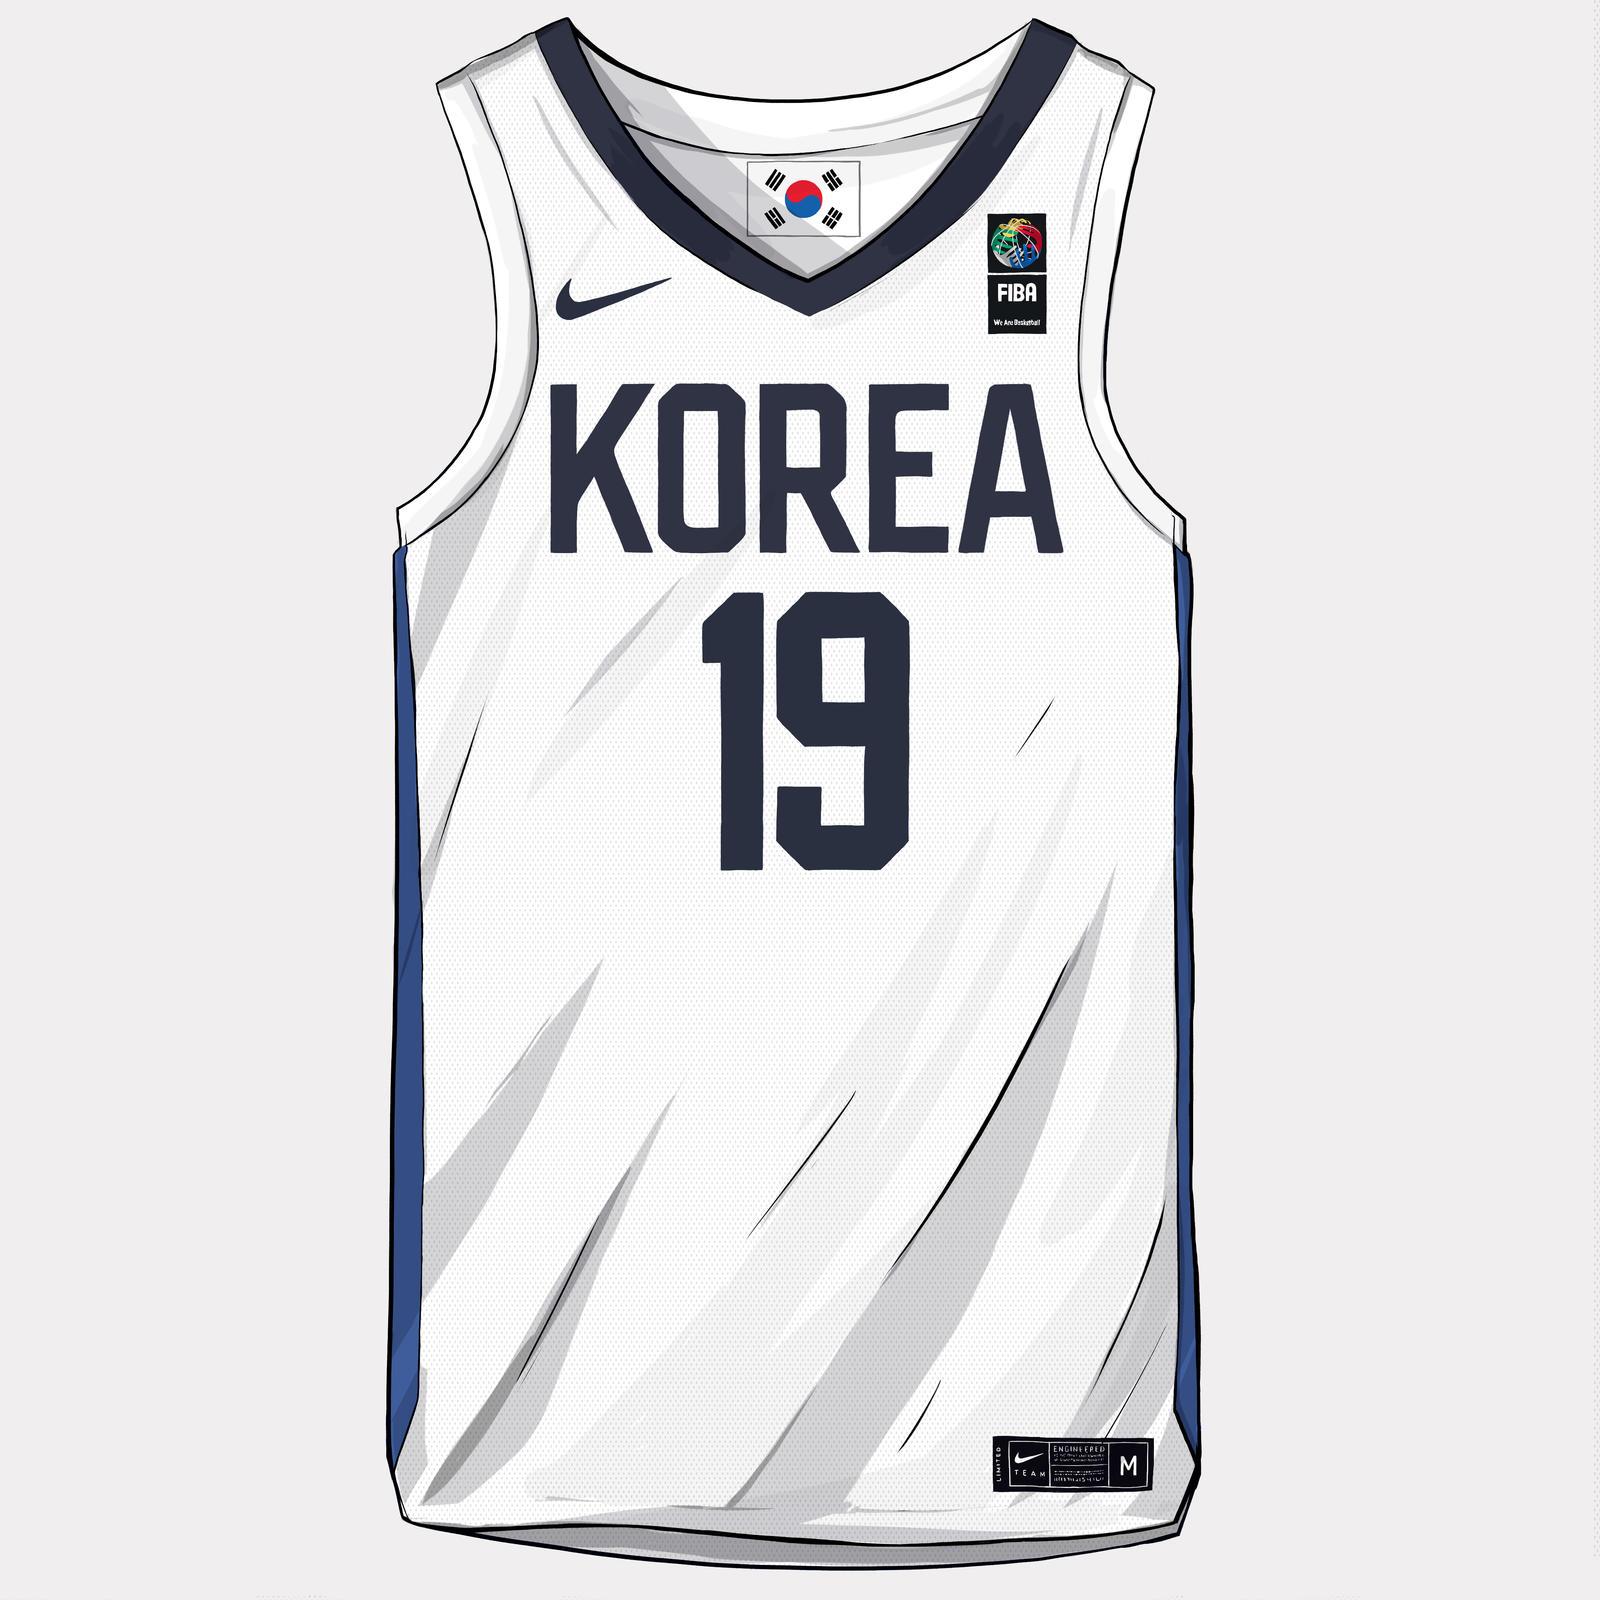 nike-news-korea-national-team-kit-2019-illustration-1x1_2_89540.jpg